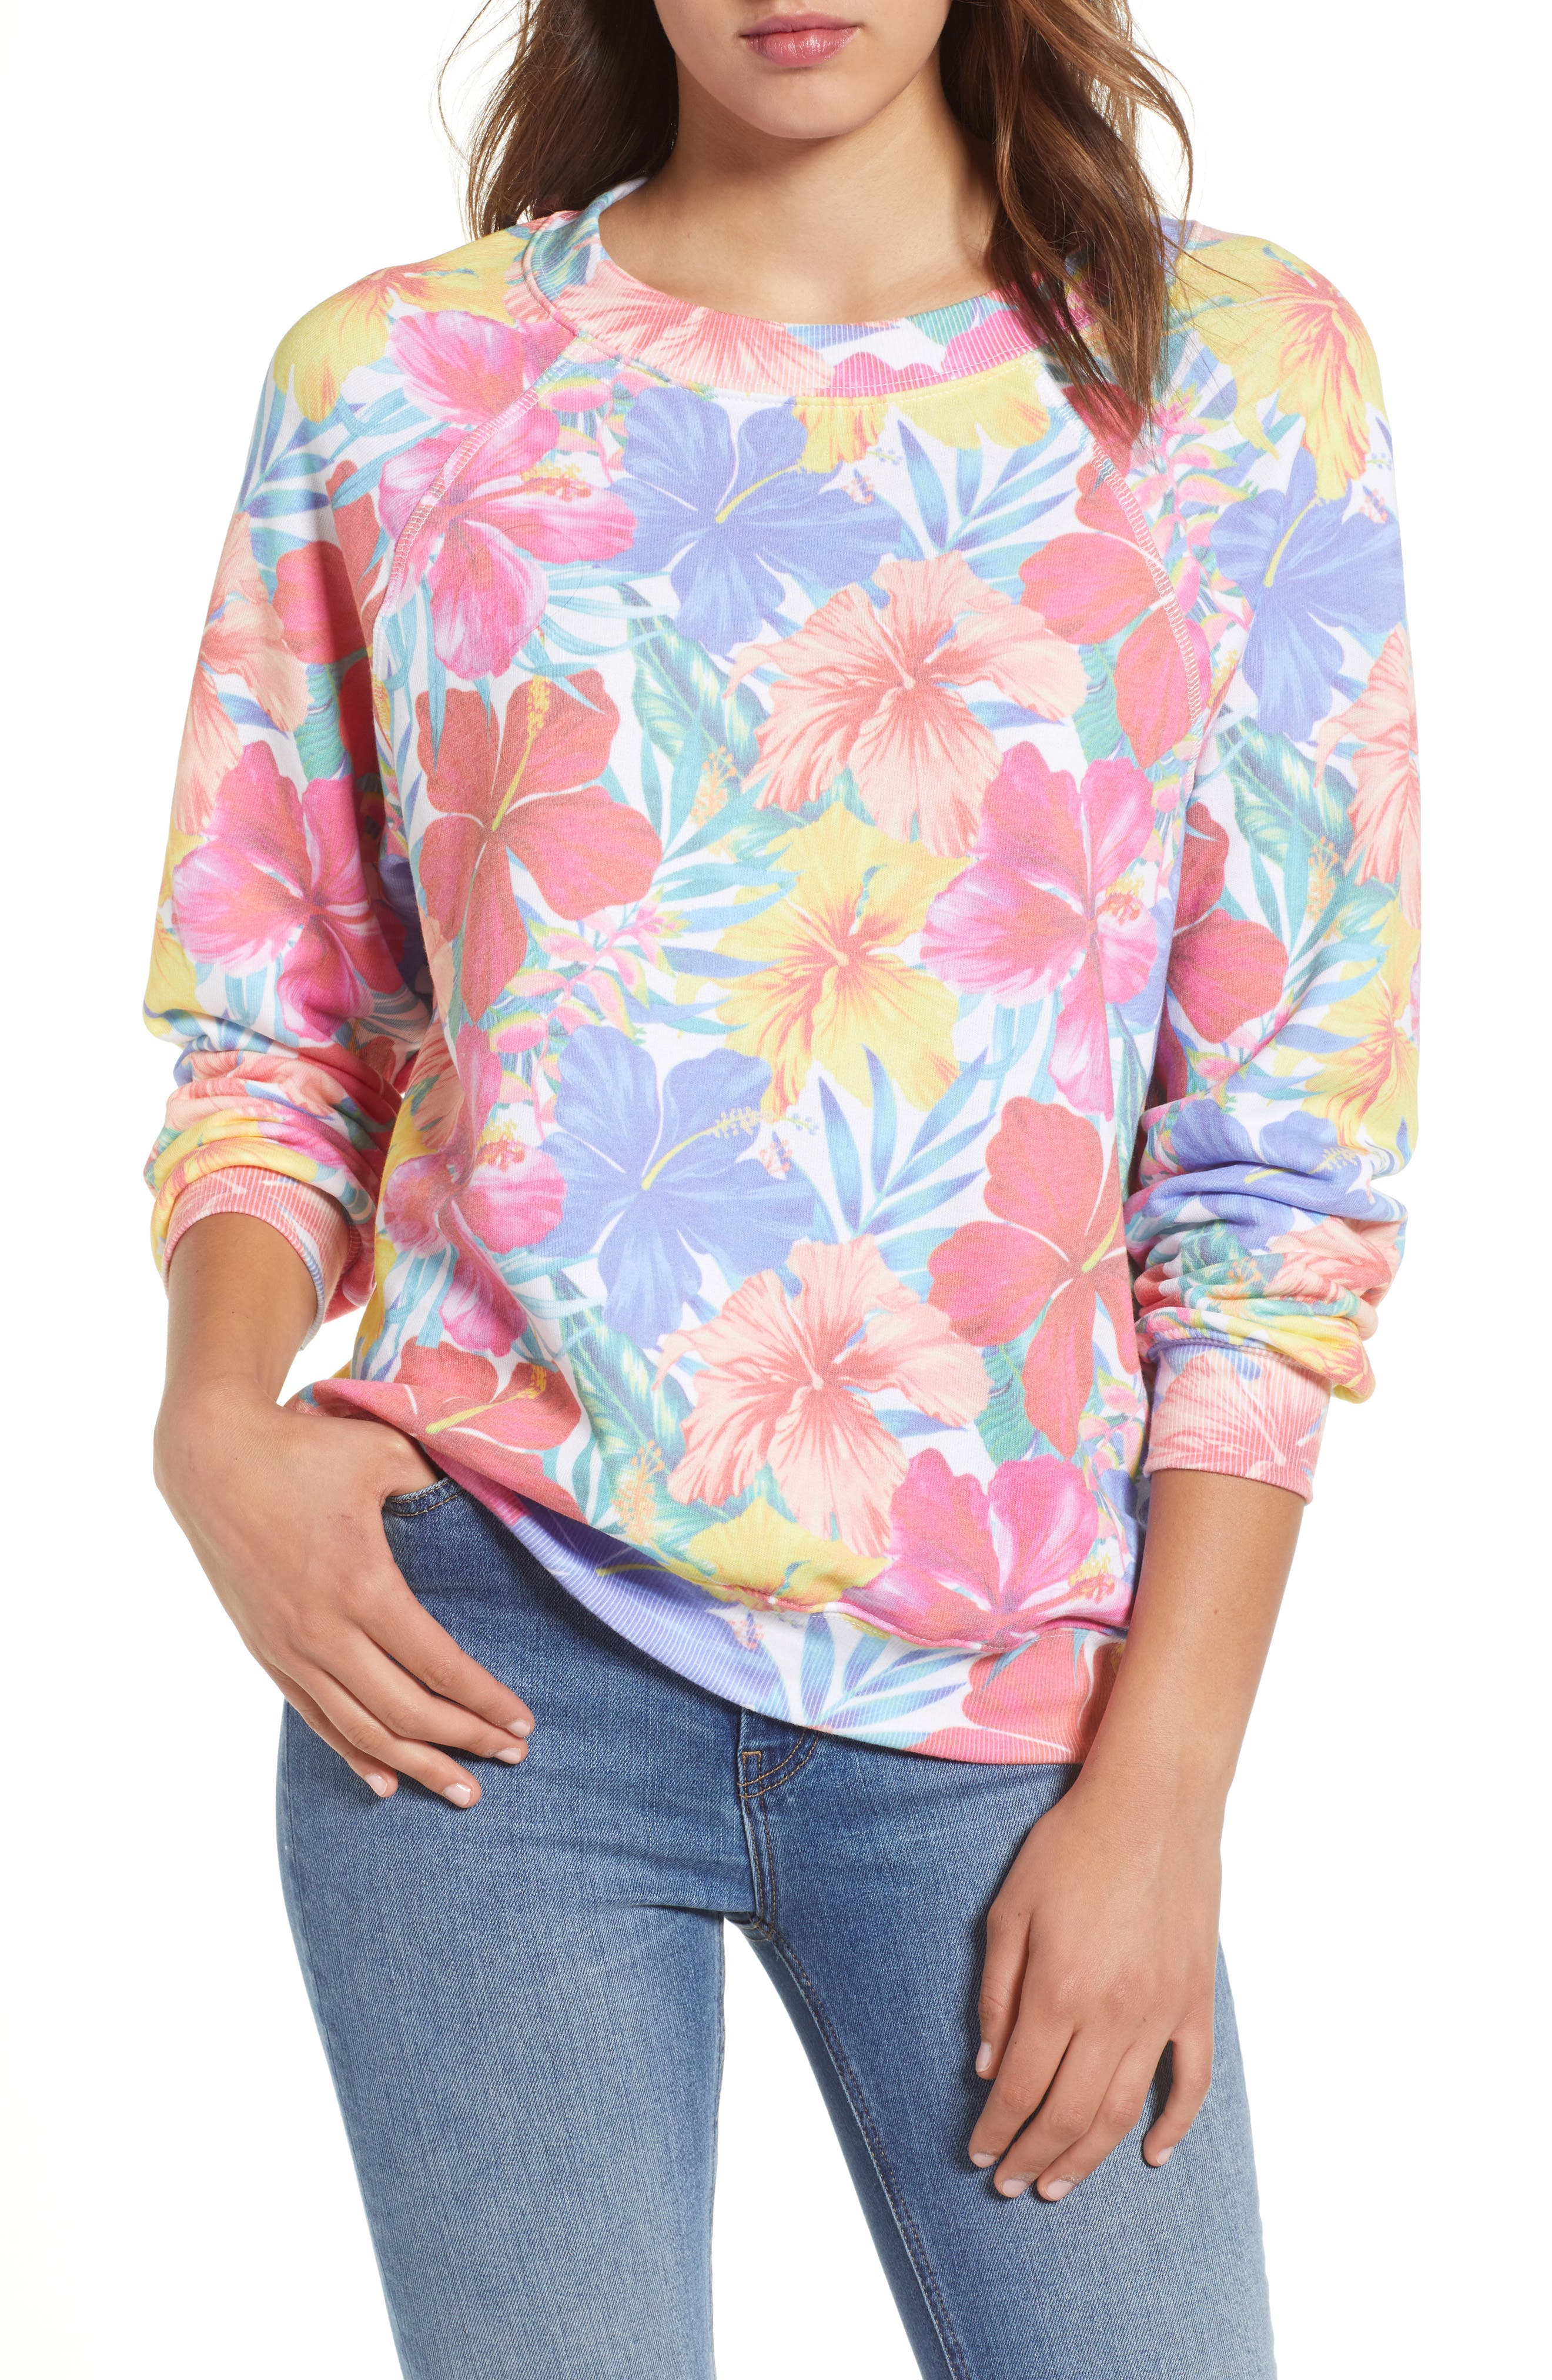 Tropicalia Sommers Sweatshirt,                         Main,                         color, Multi Colored